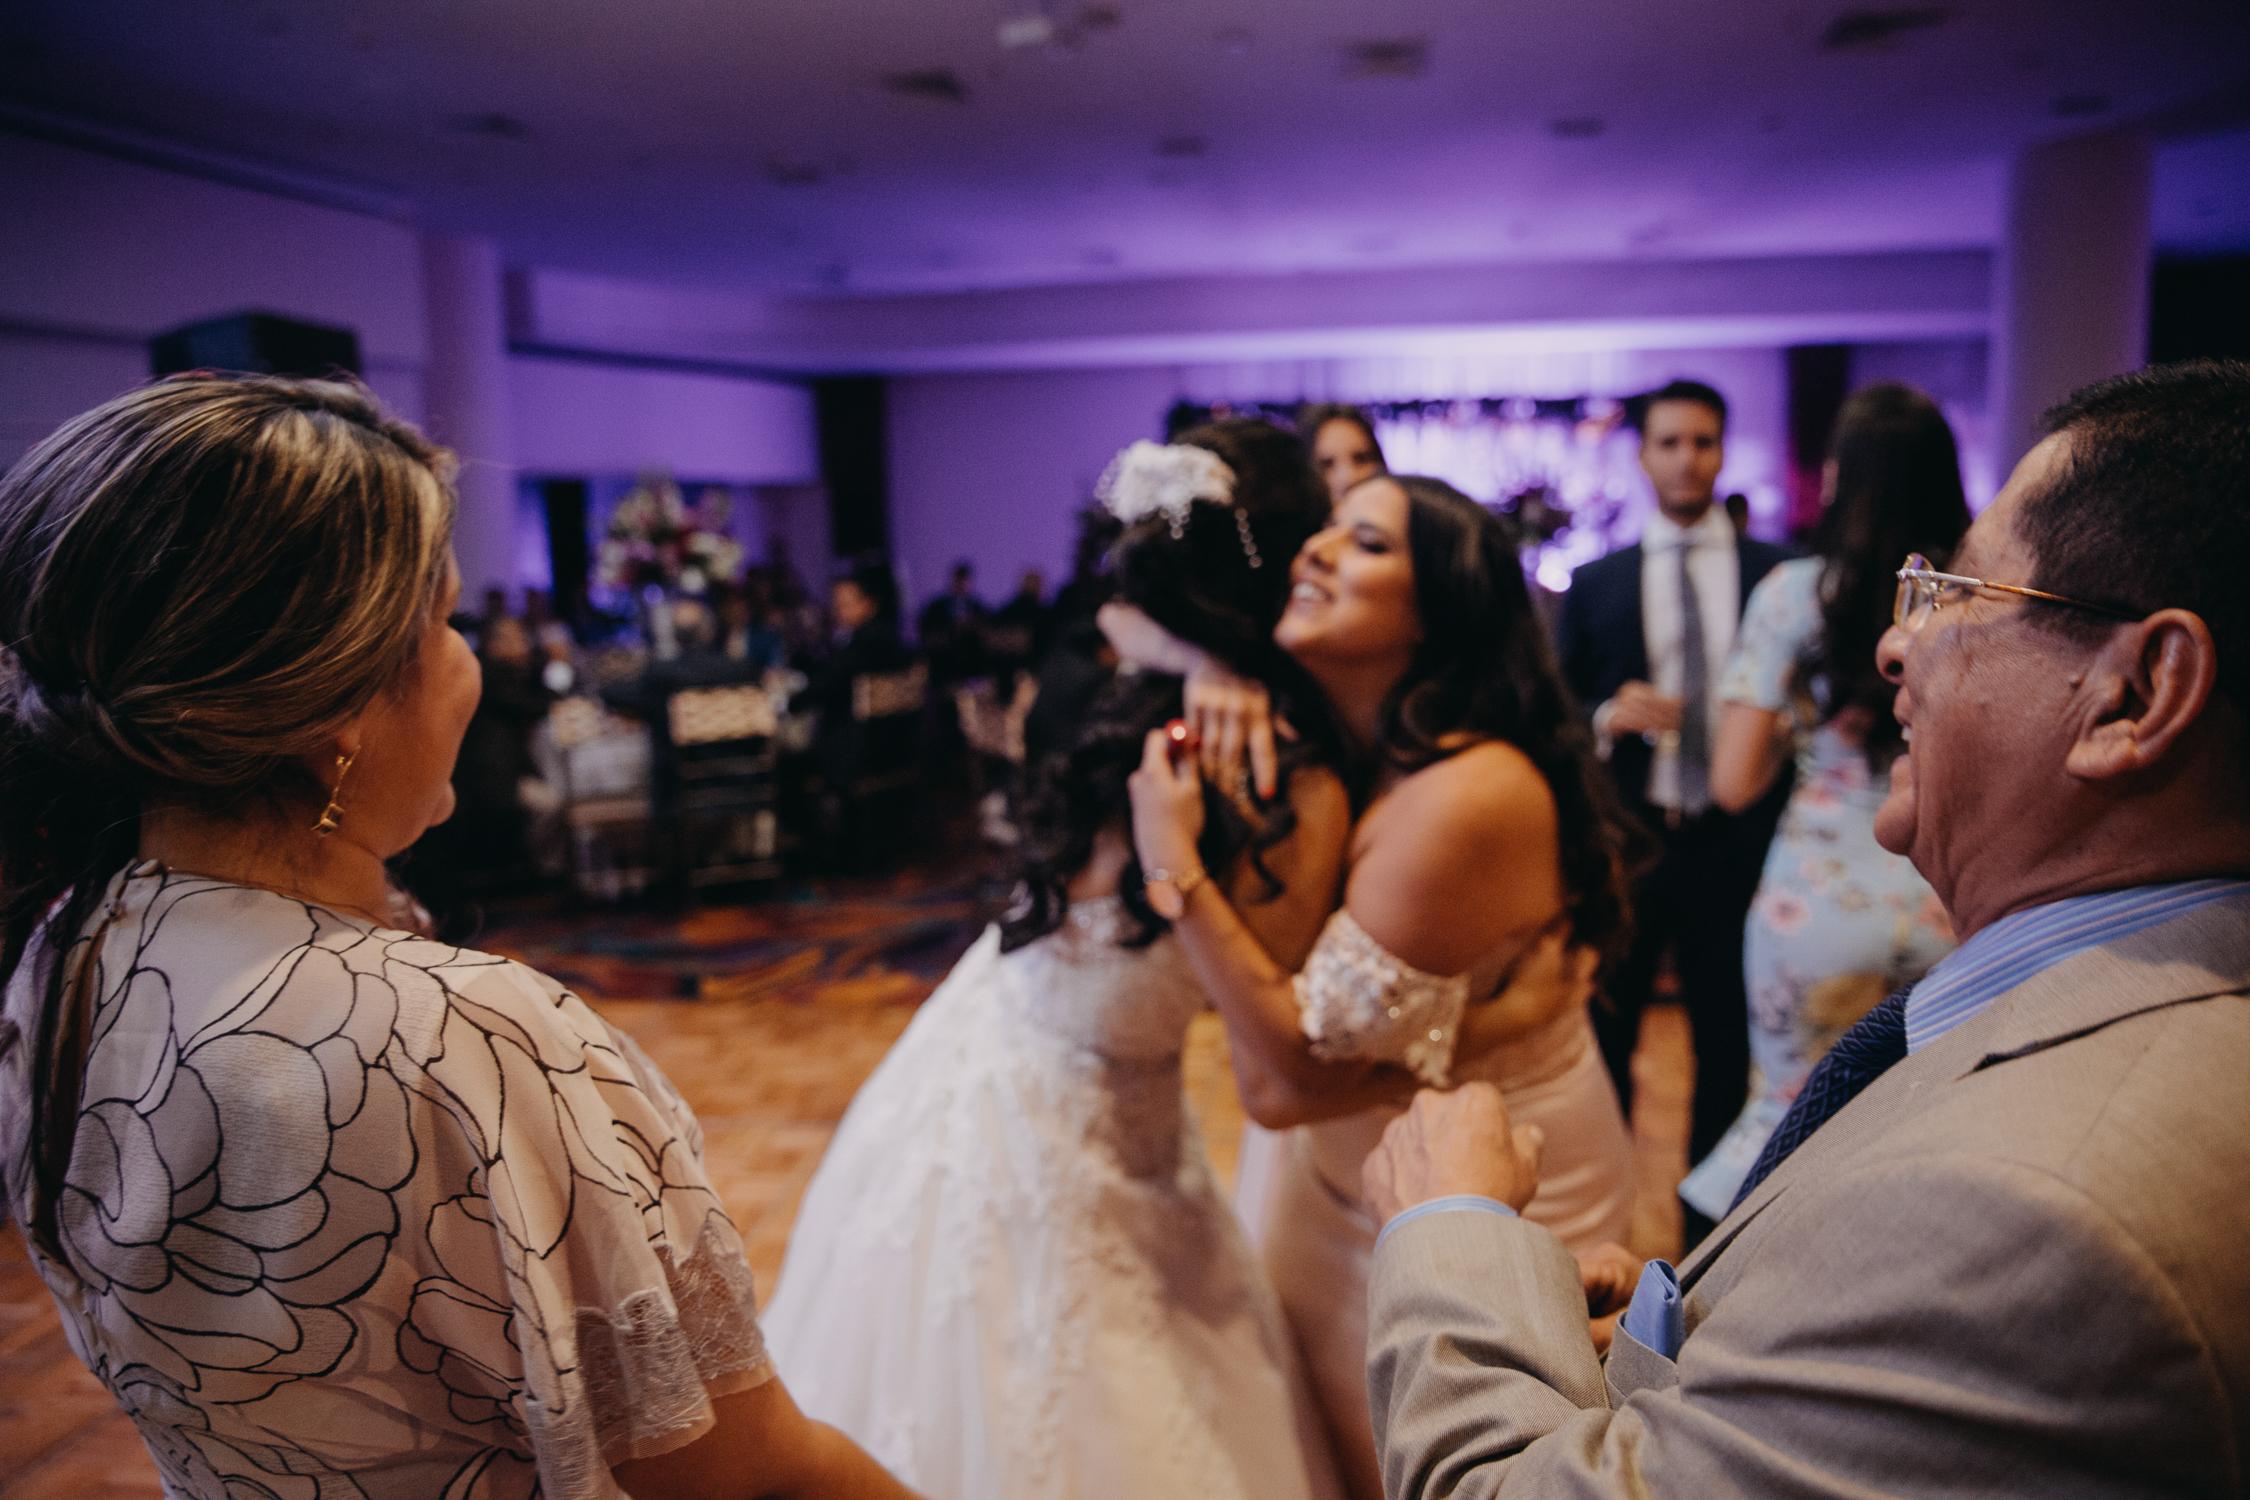 Michelle-Agurto-Fotografia-Bodas-Ecuador-Destination-Wedding-Photographer-Daniela-Dirk-89.JPG